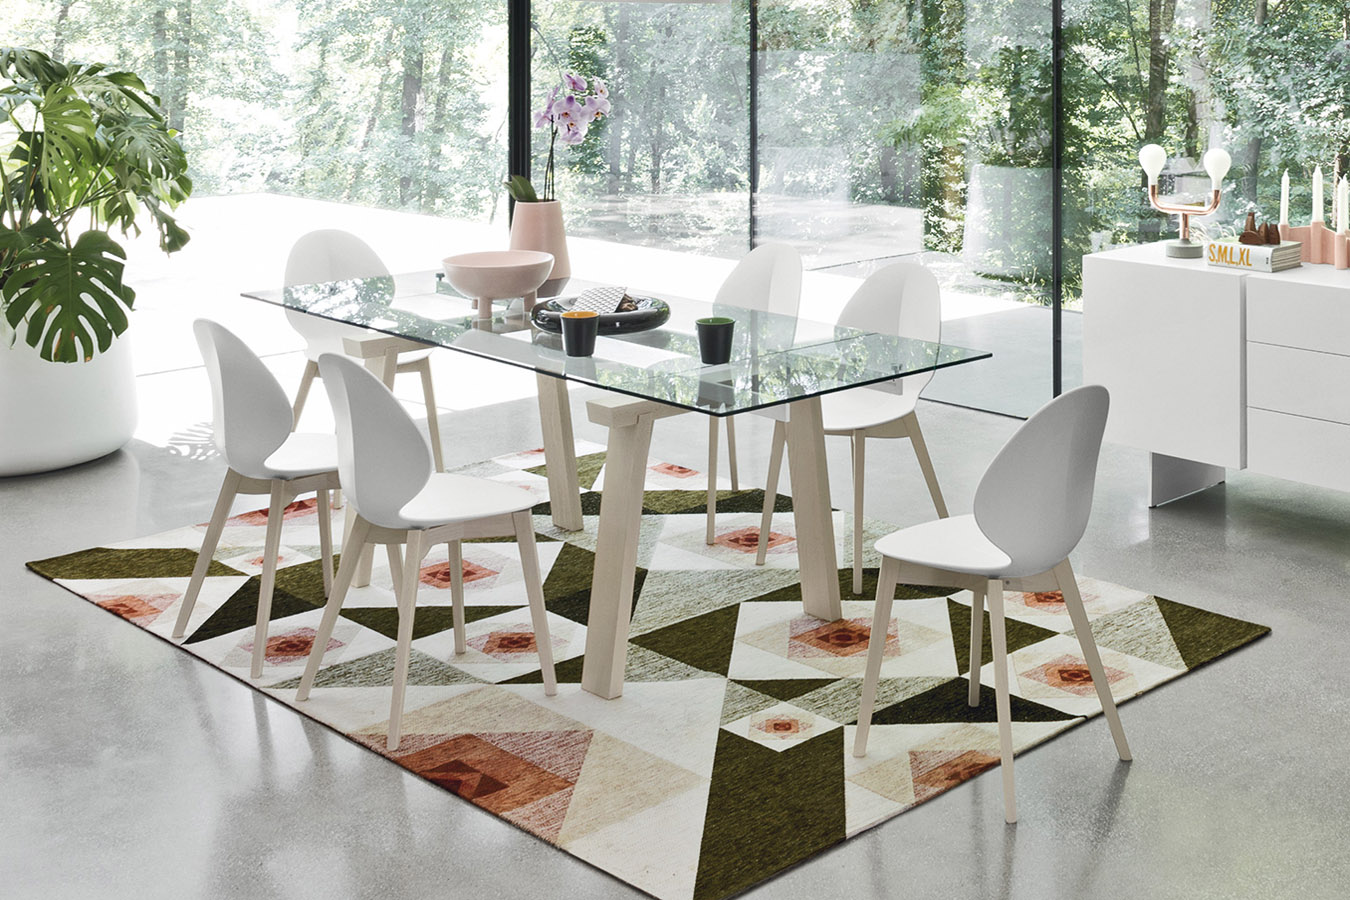 Best tavoli e sedie da cucina calligaris contemporary for Sedie e tavoli calligaris prezzi